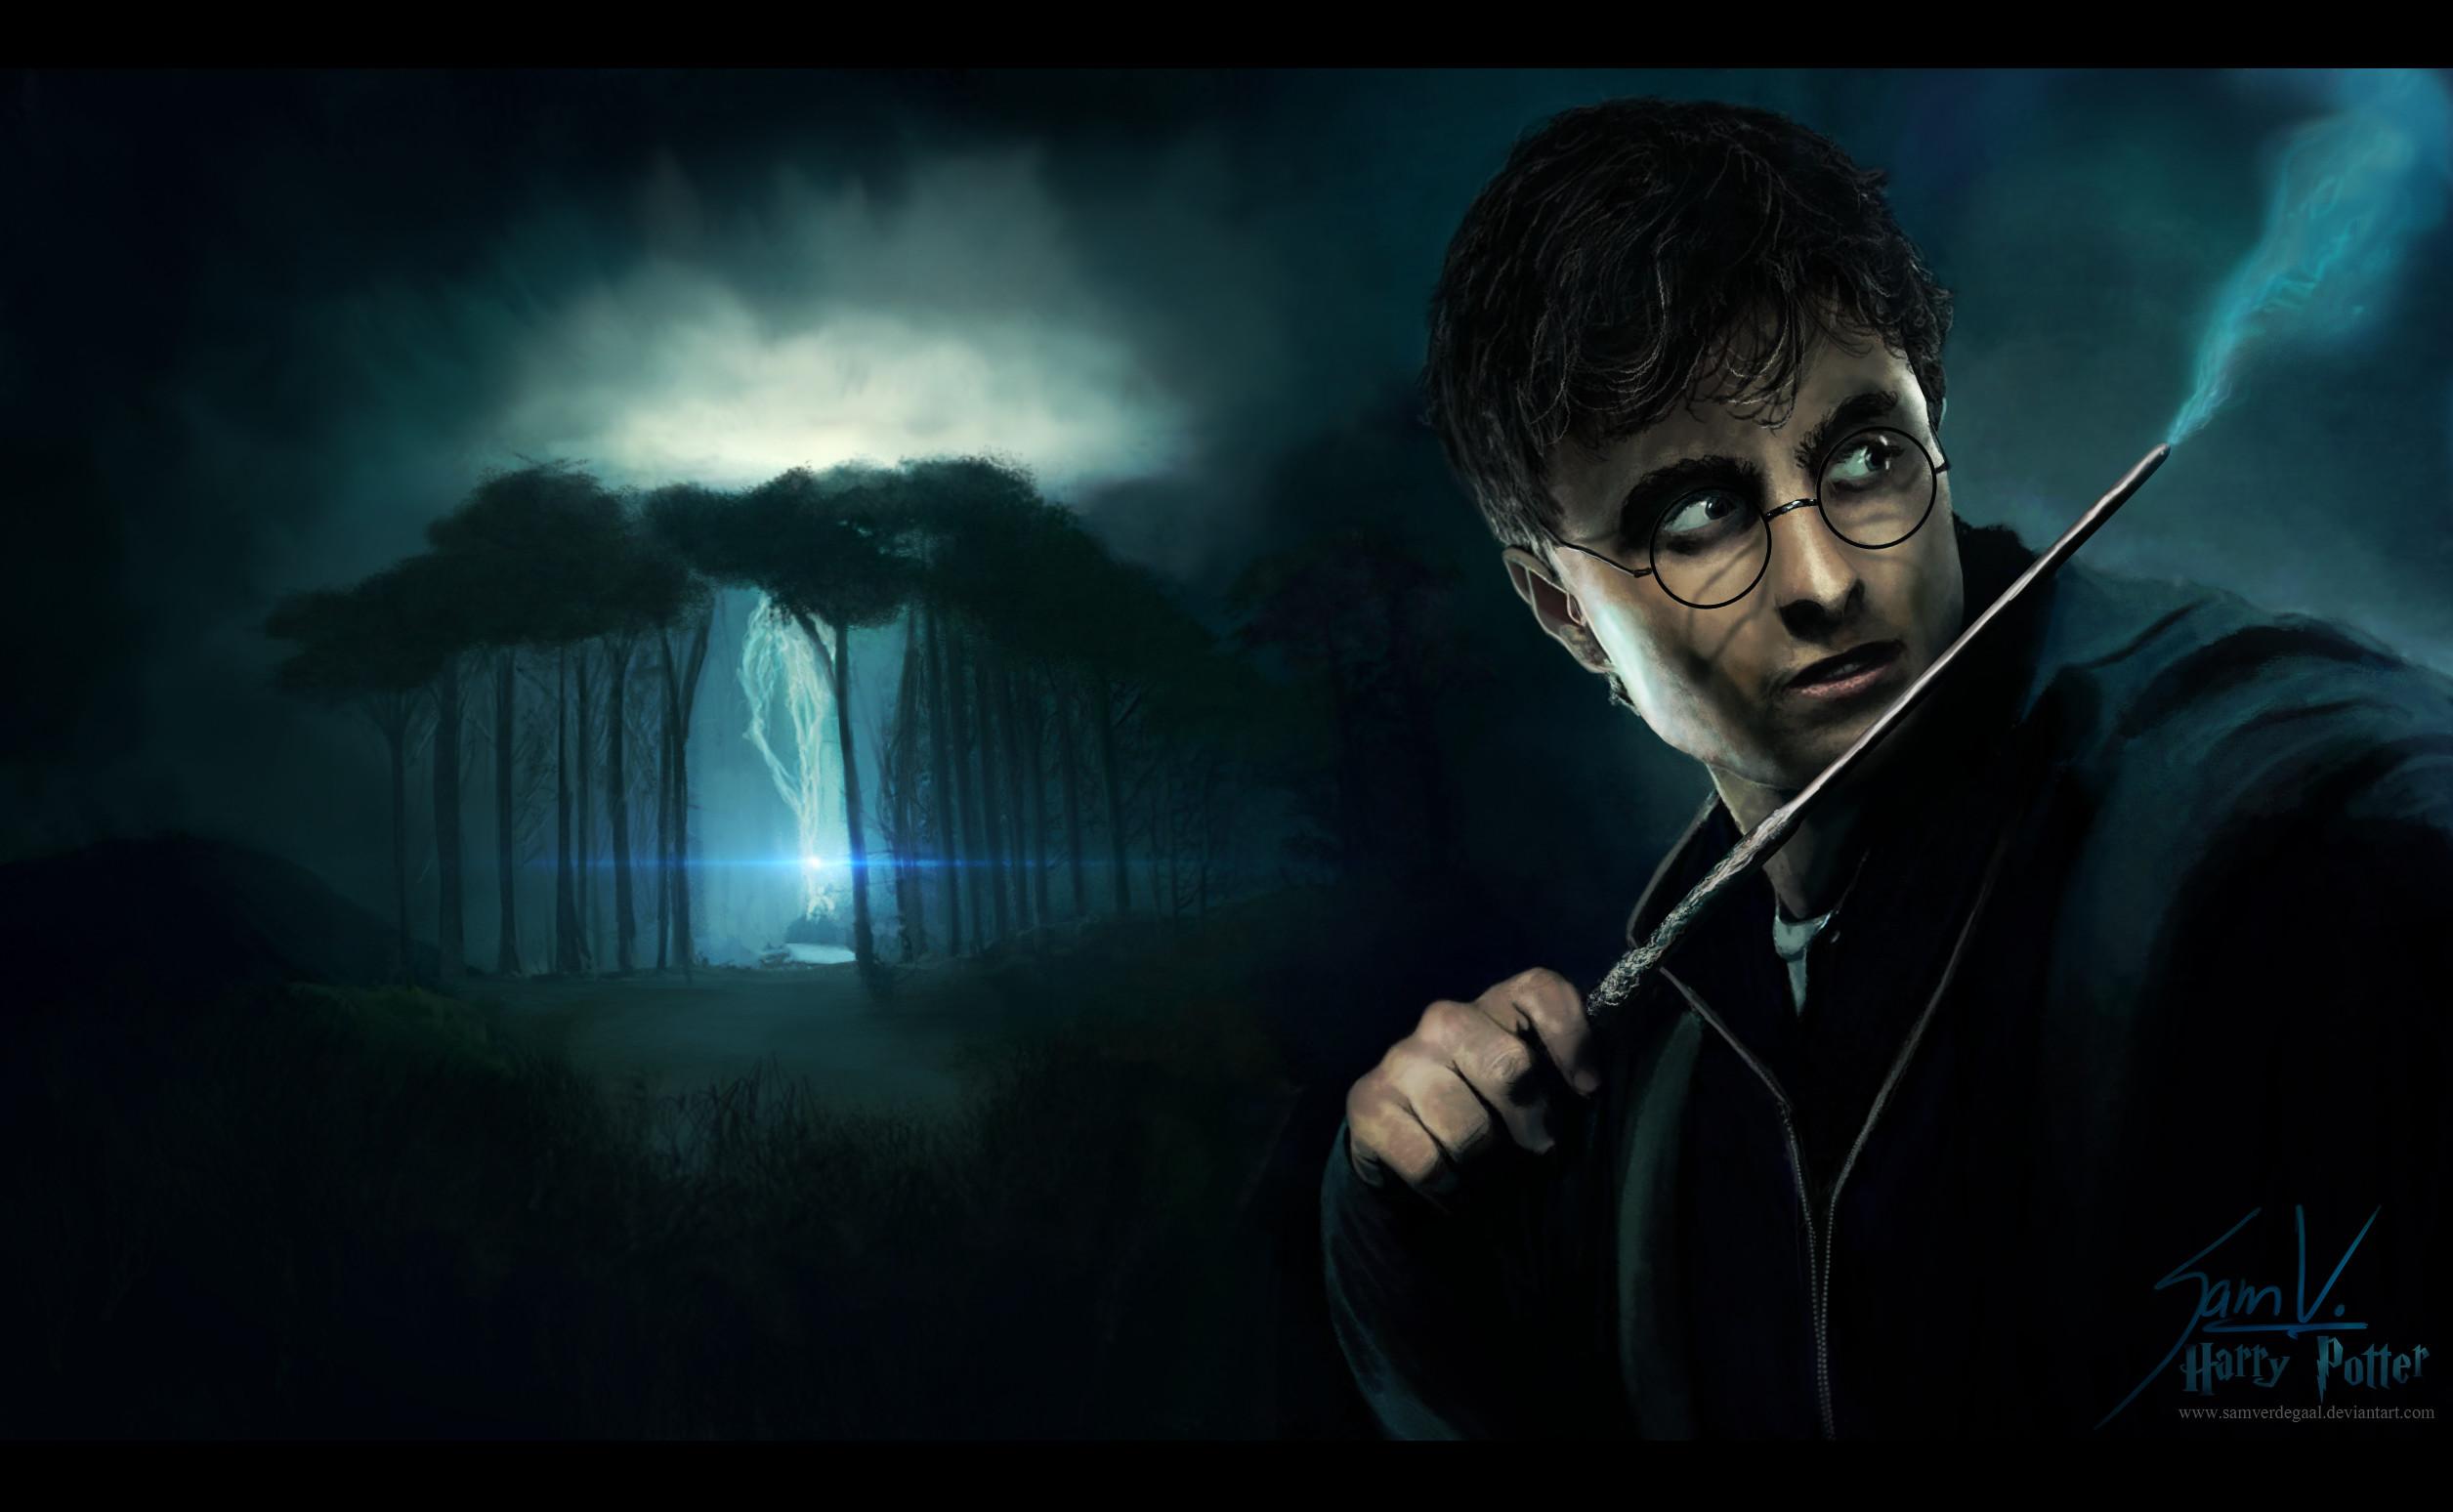 Harry Potter Wallpaper (77+ images)